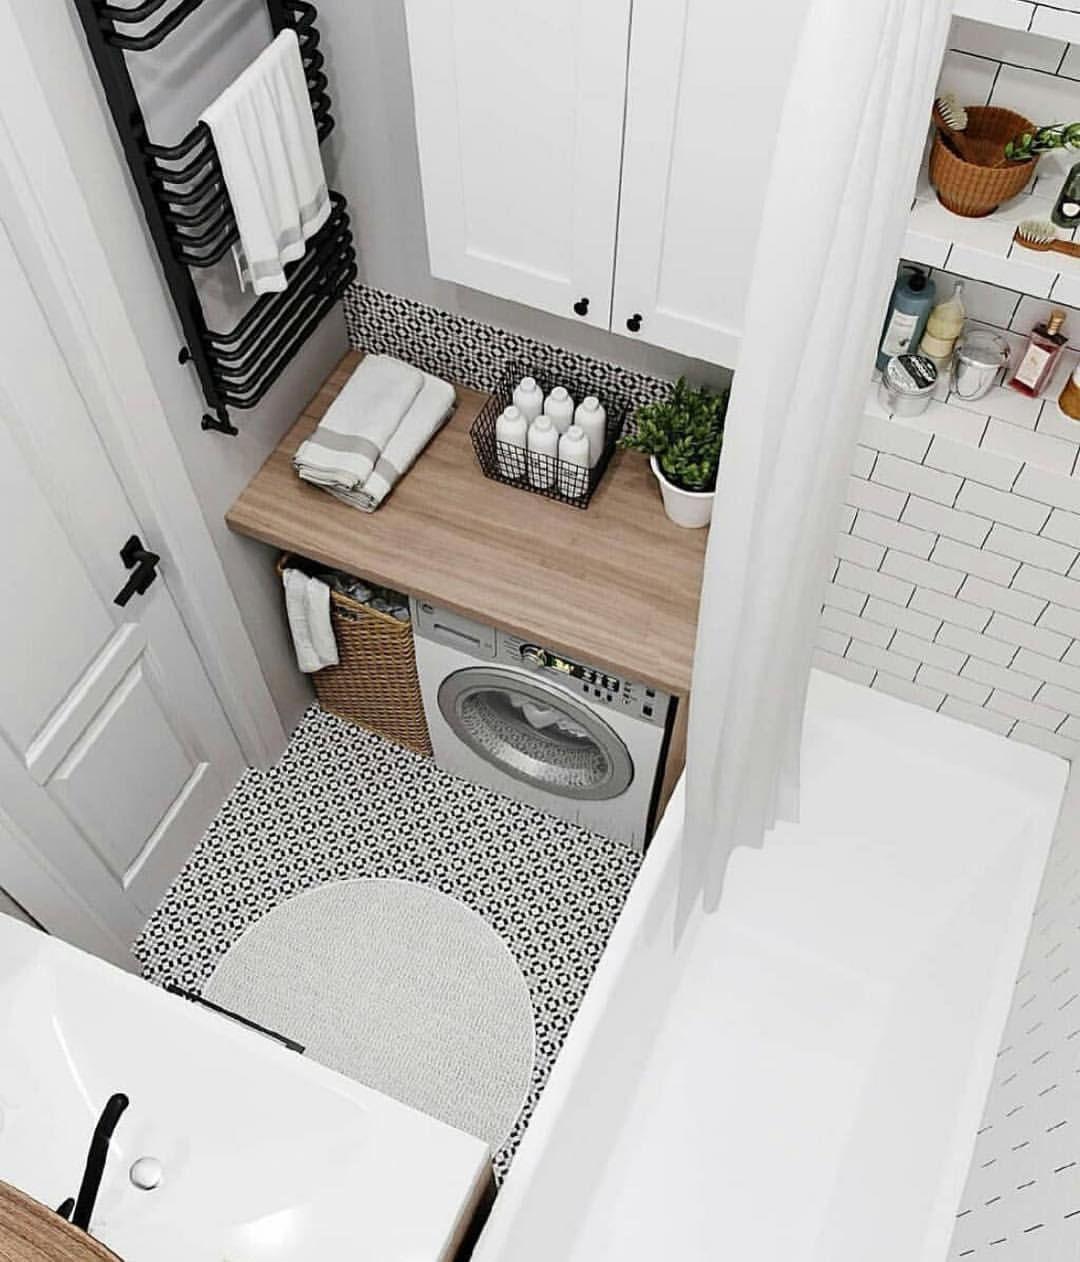 Stylish Ways To Decorate Small Bathroom Ideas 6x6 Tips For 2019 Small Bathroom Ideas On A Budget Tiny House Bathroom Interior